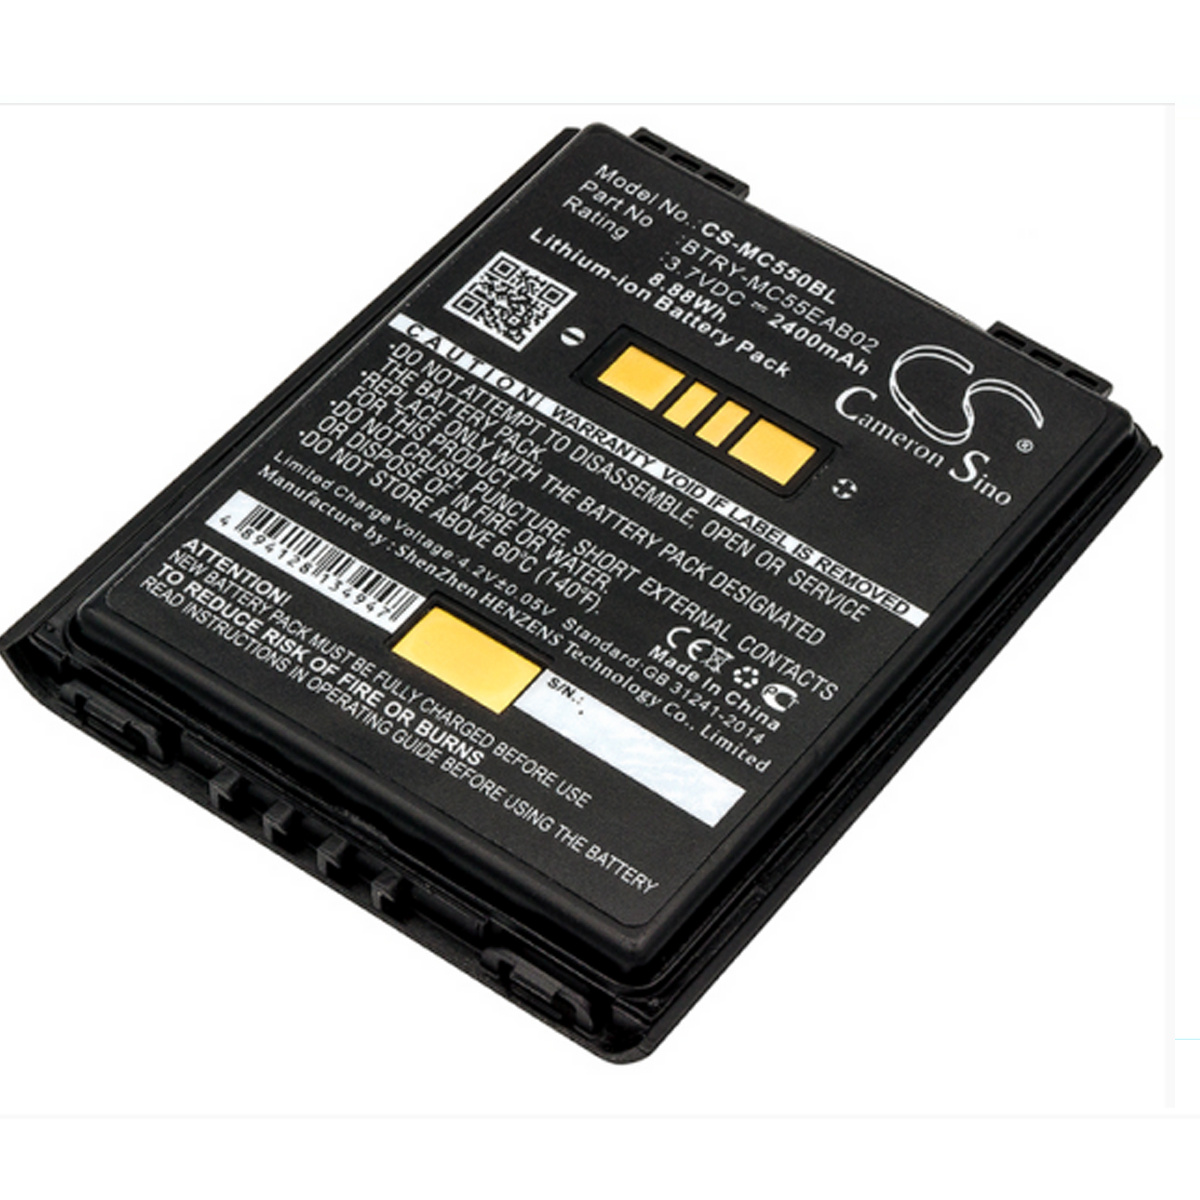 8.88Wh MC5574 MC5590 Scanner baterias PN: 82-111094-01 BTRY-MC55EAB02 U60493